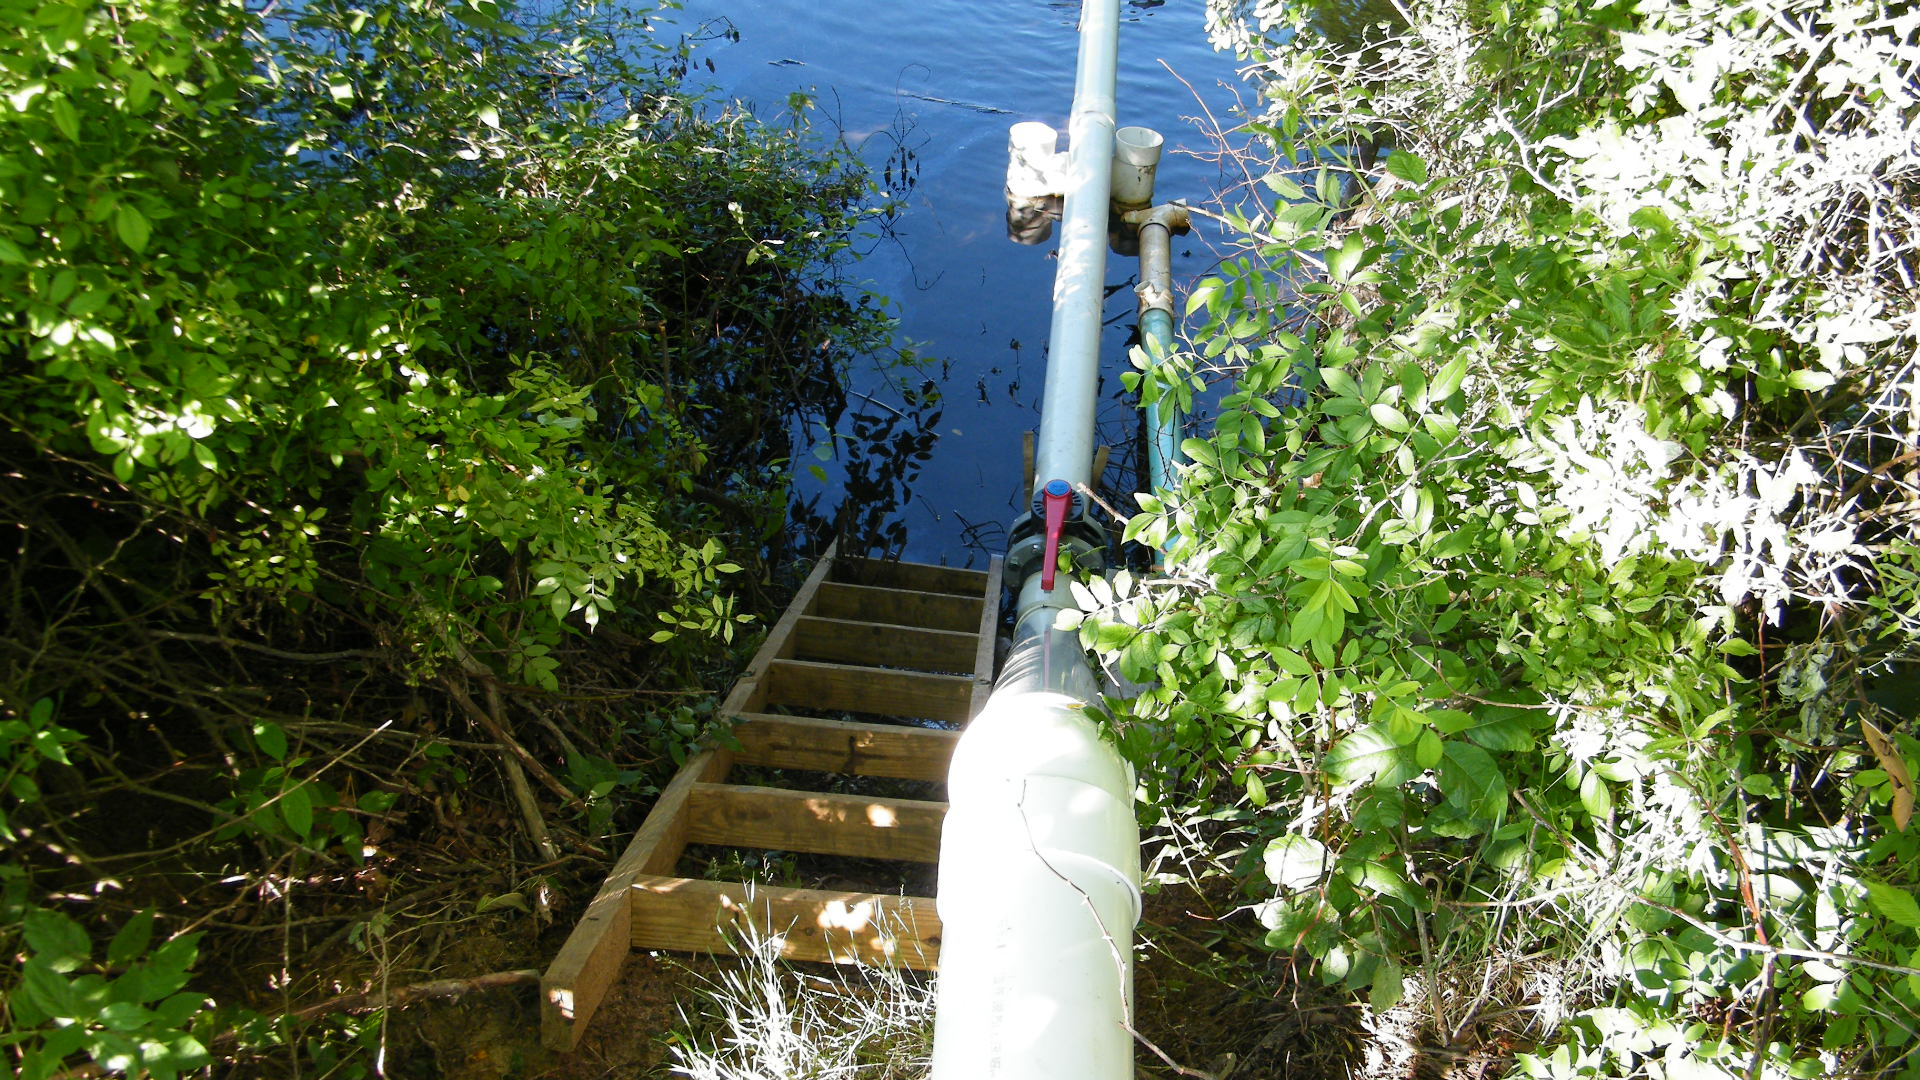 10.0610 Beaver Dam Project-06-20-10 007.jpg